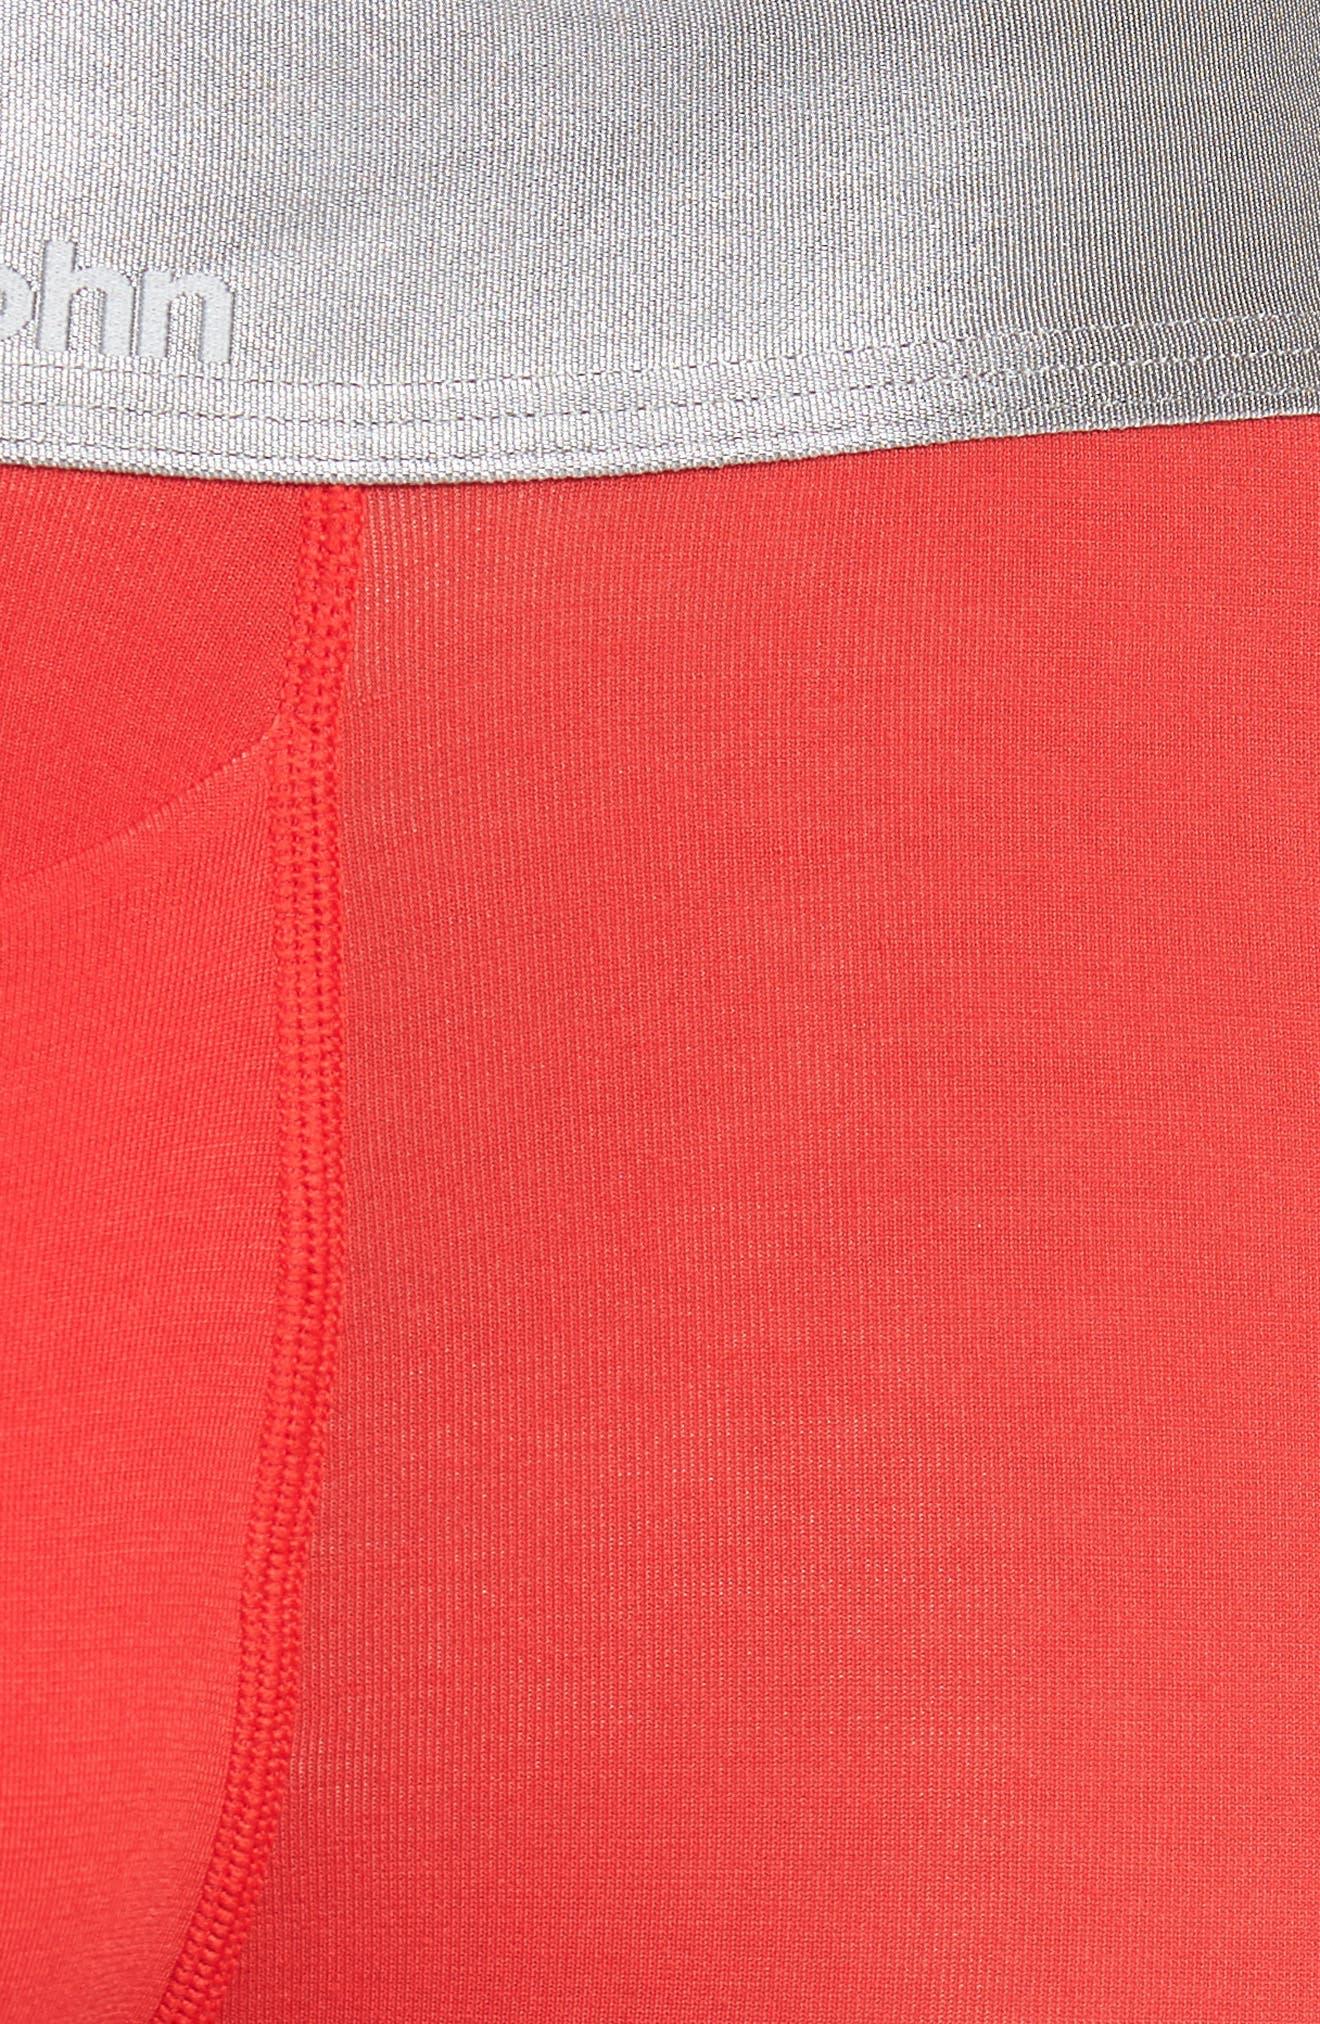 Second Skin Trunks,                             Alternate thumbnail 5, color,                             True Red/ Dress Blue